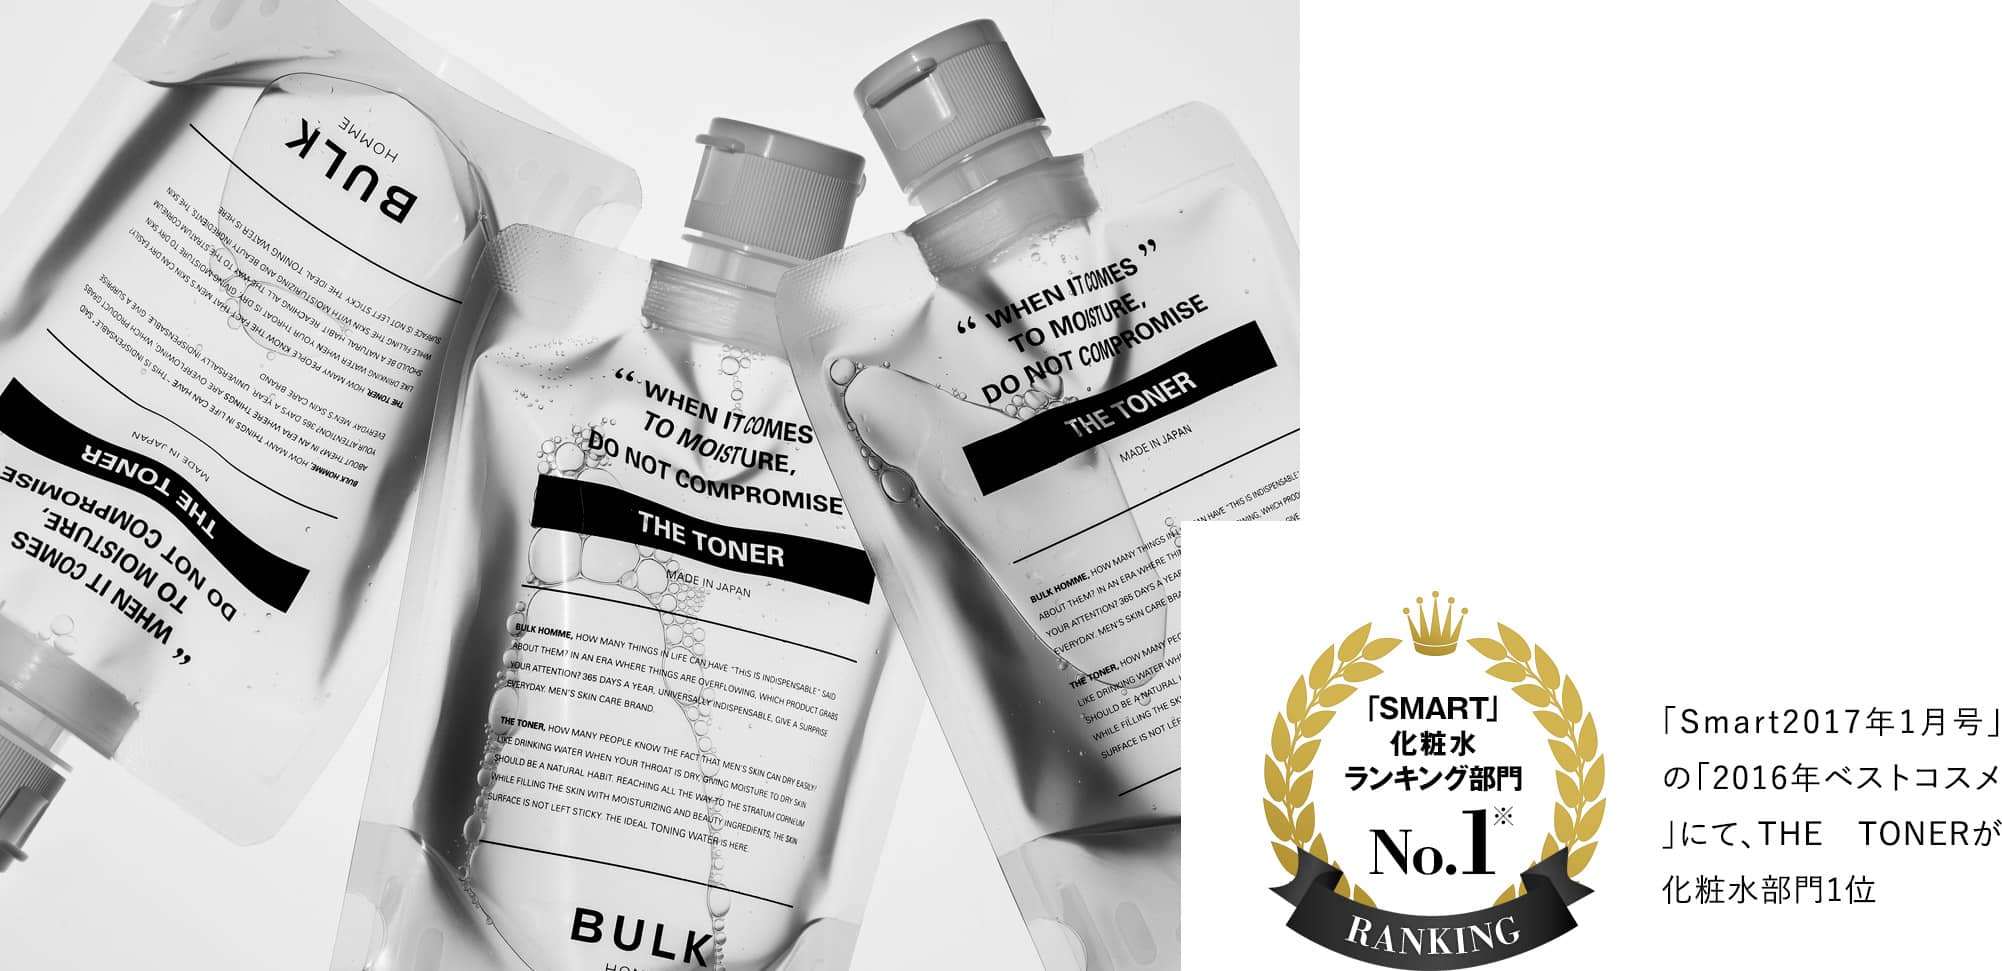 「Smart2017年1月号」の「2016年ベストコスメ」にて、THE TONERが化粧水部門1位